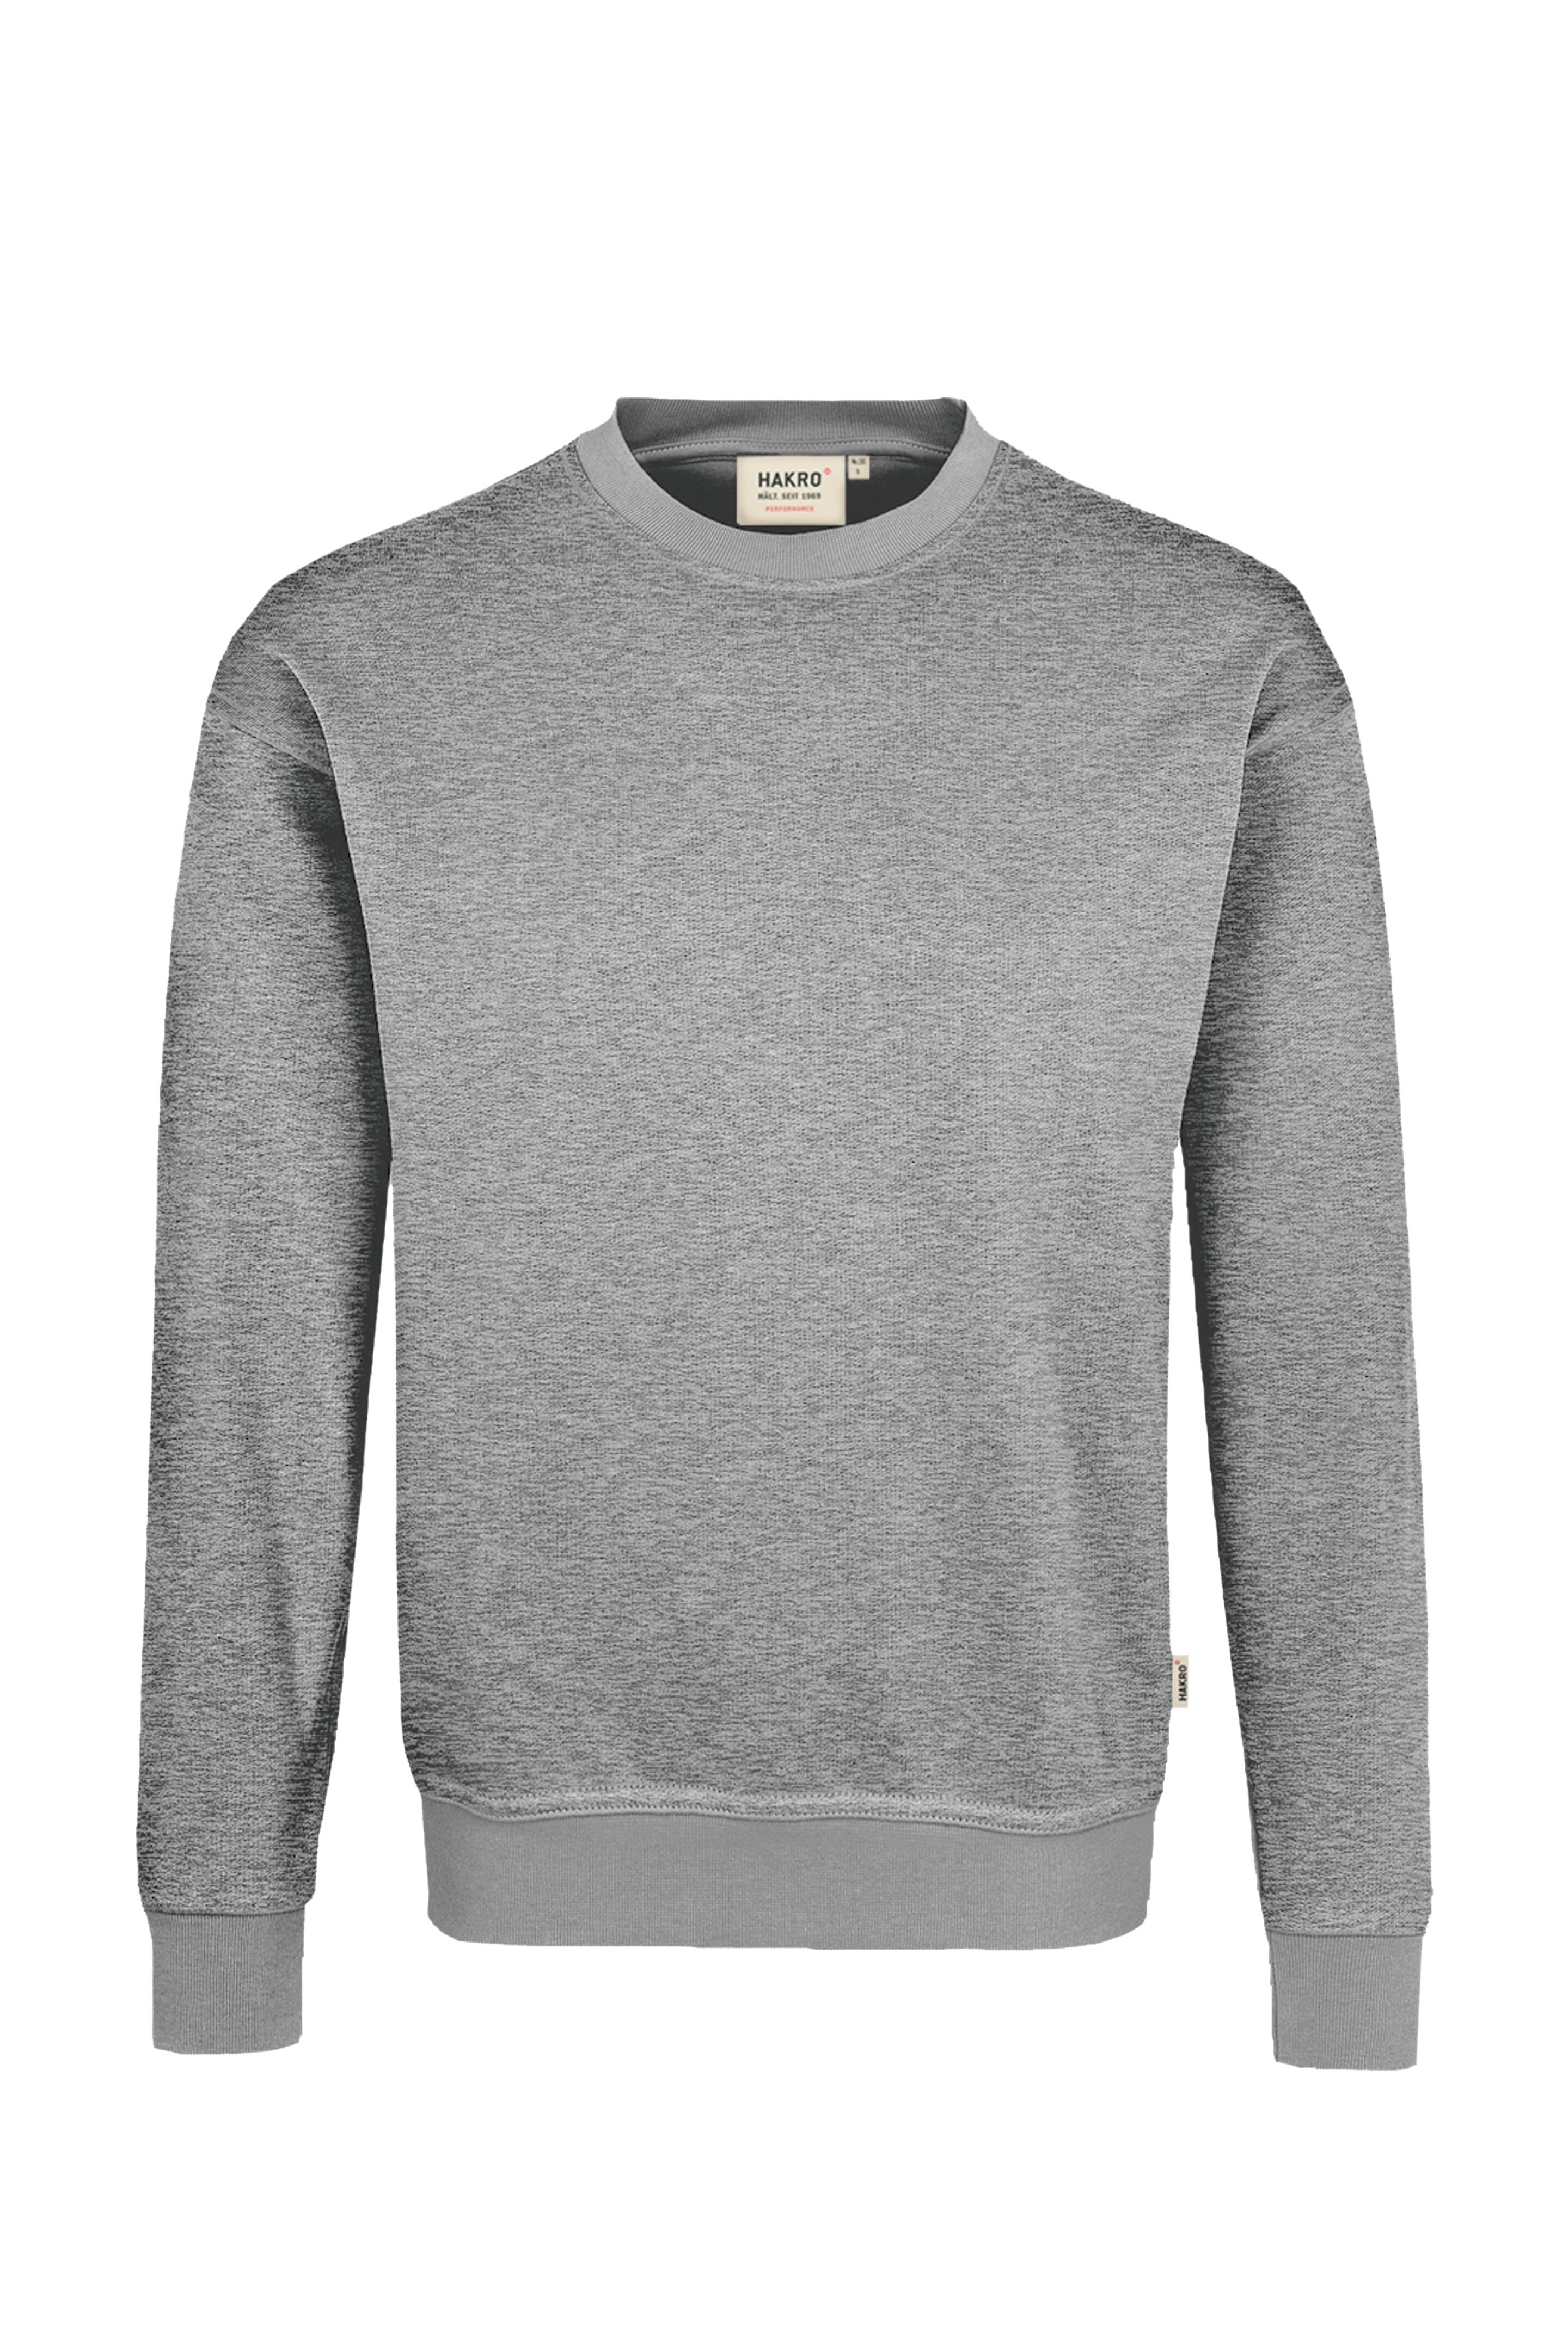 Performance Sweatshirt 475